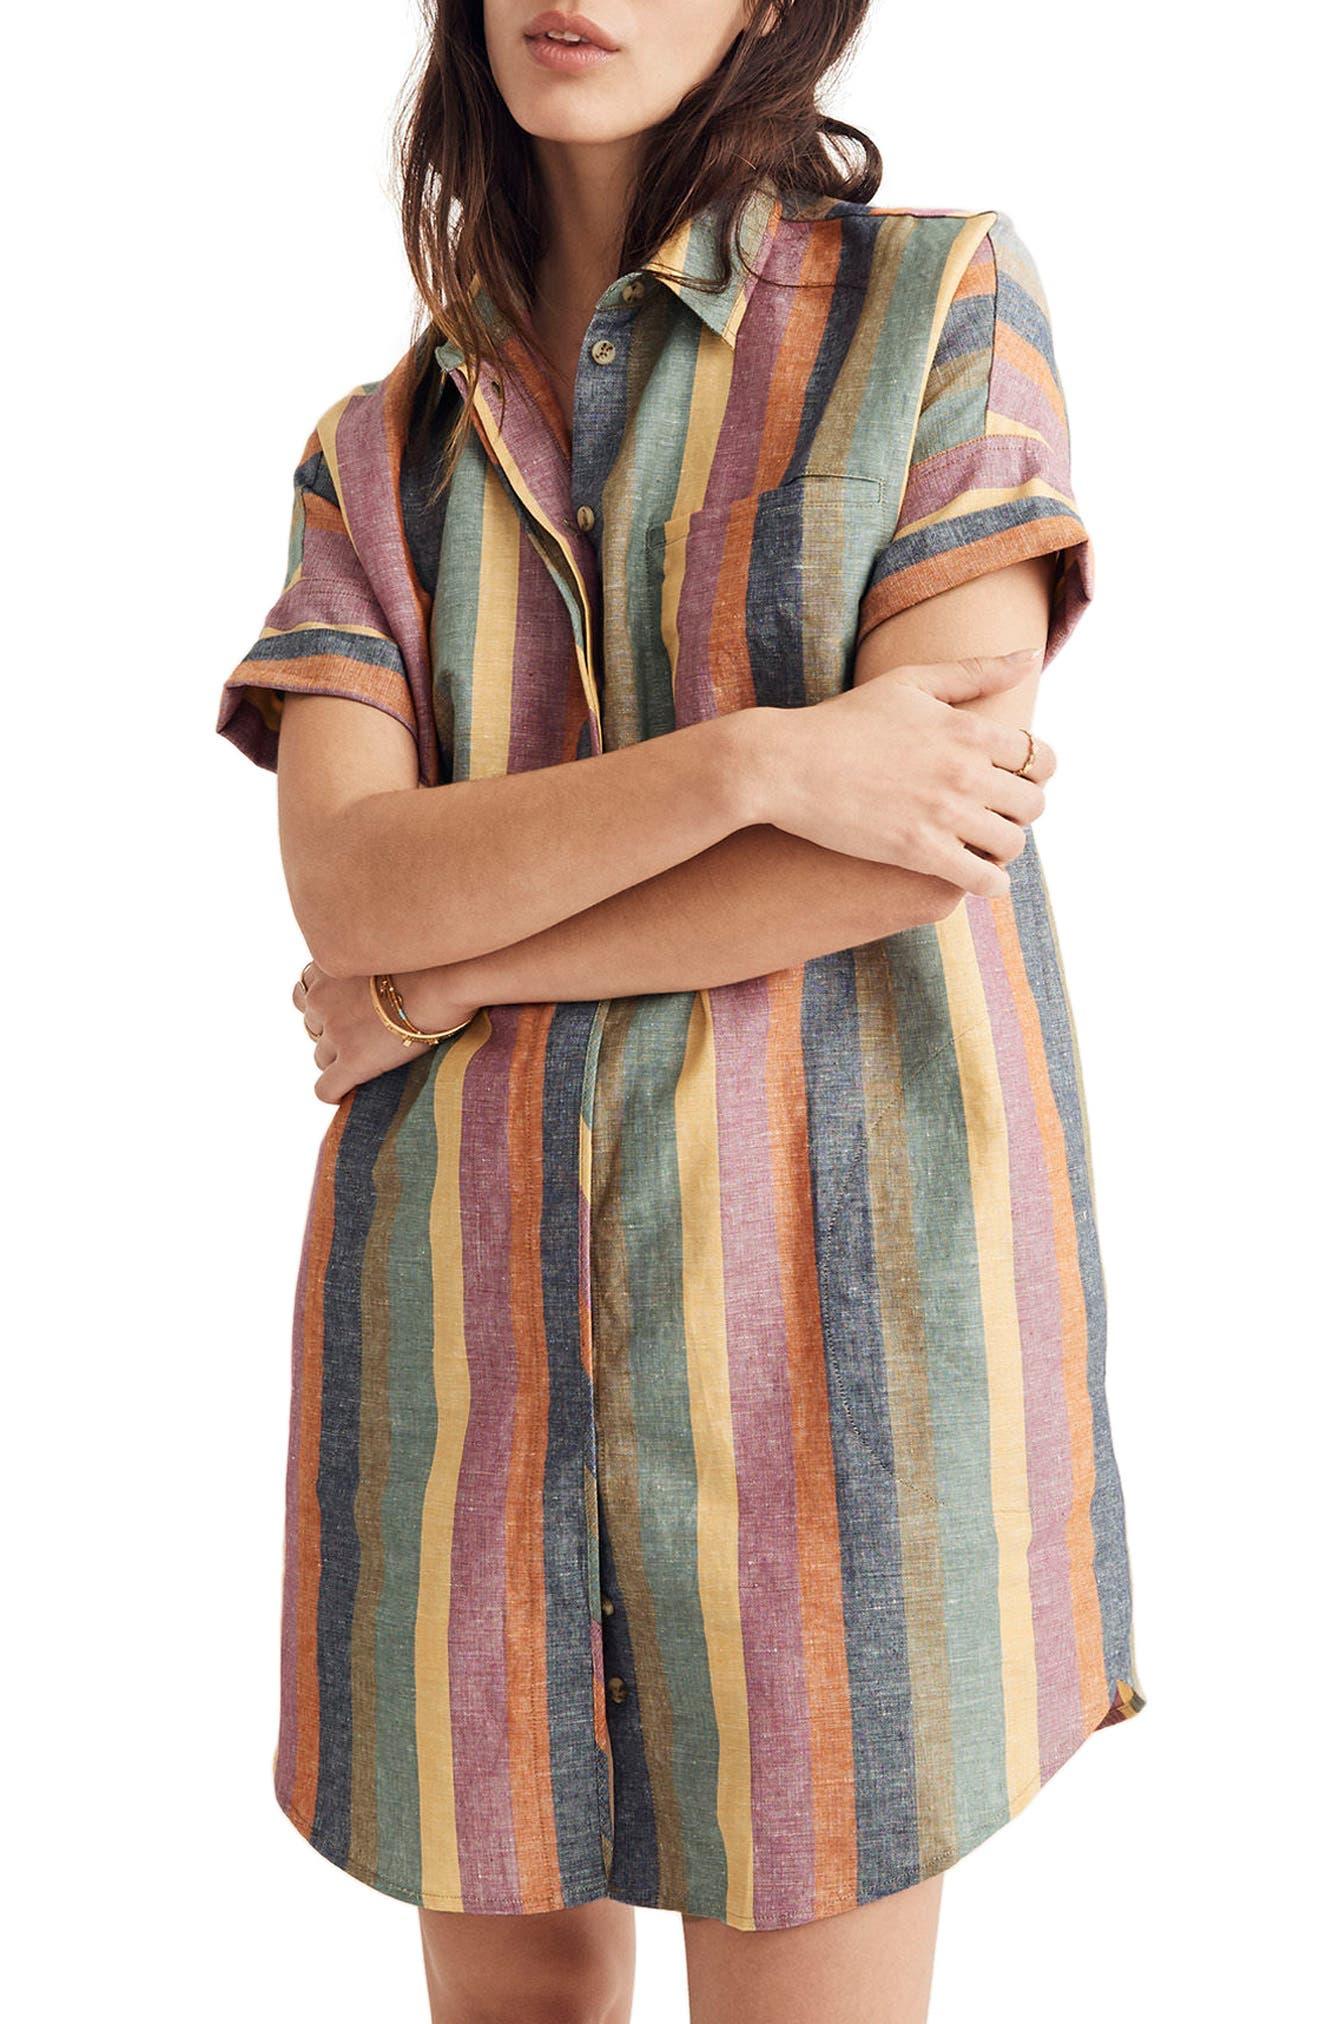 MADEWELL,                             Courier Rainbow Stripe Linen & Cotton Shirtdress,                             Main thumbnail 1, color,                             401